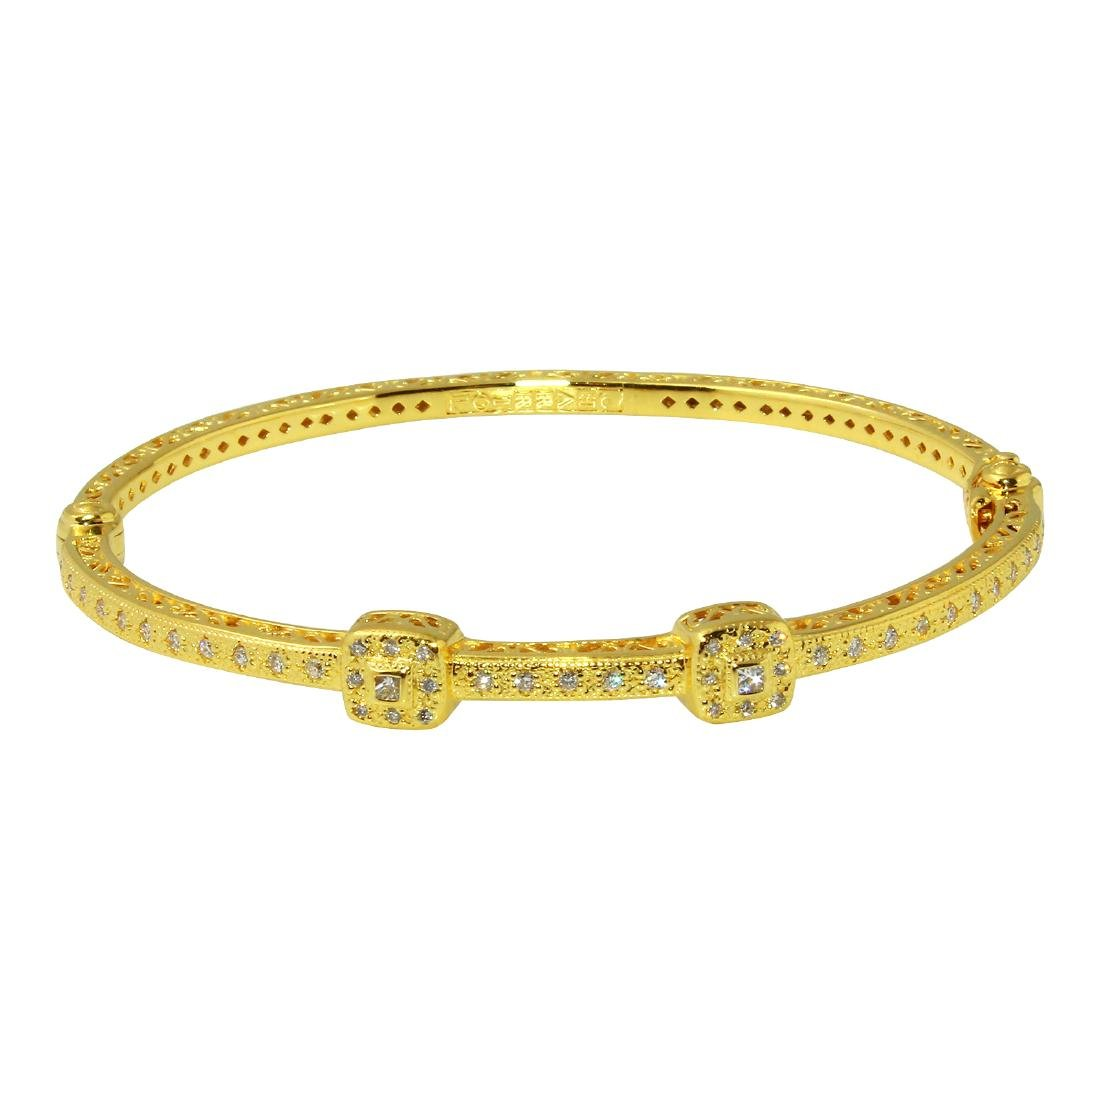 Philippe Charriol 18KT Yellow Gold Diamond Bracelet